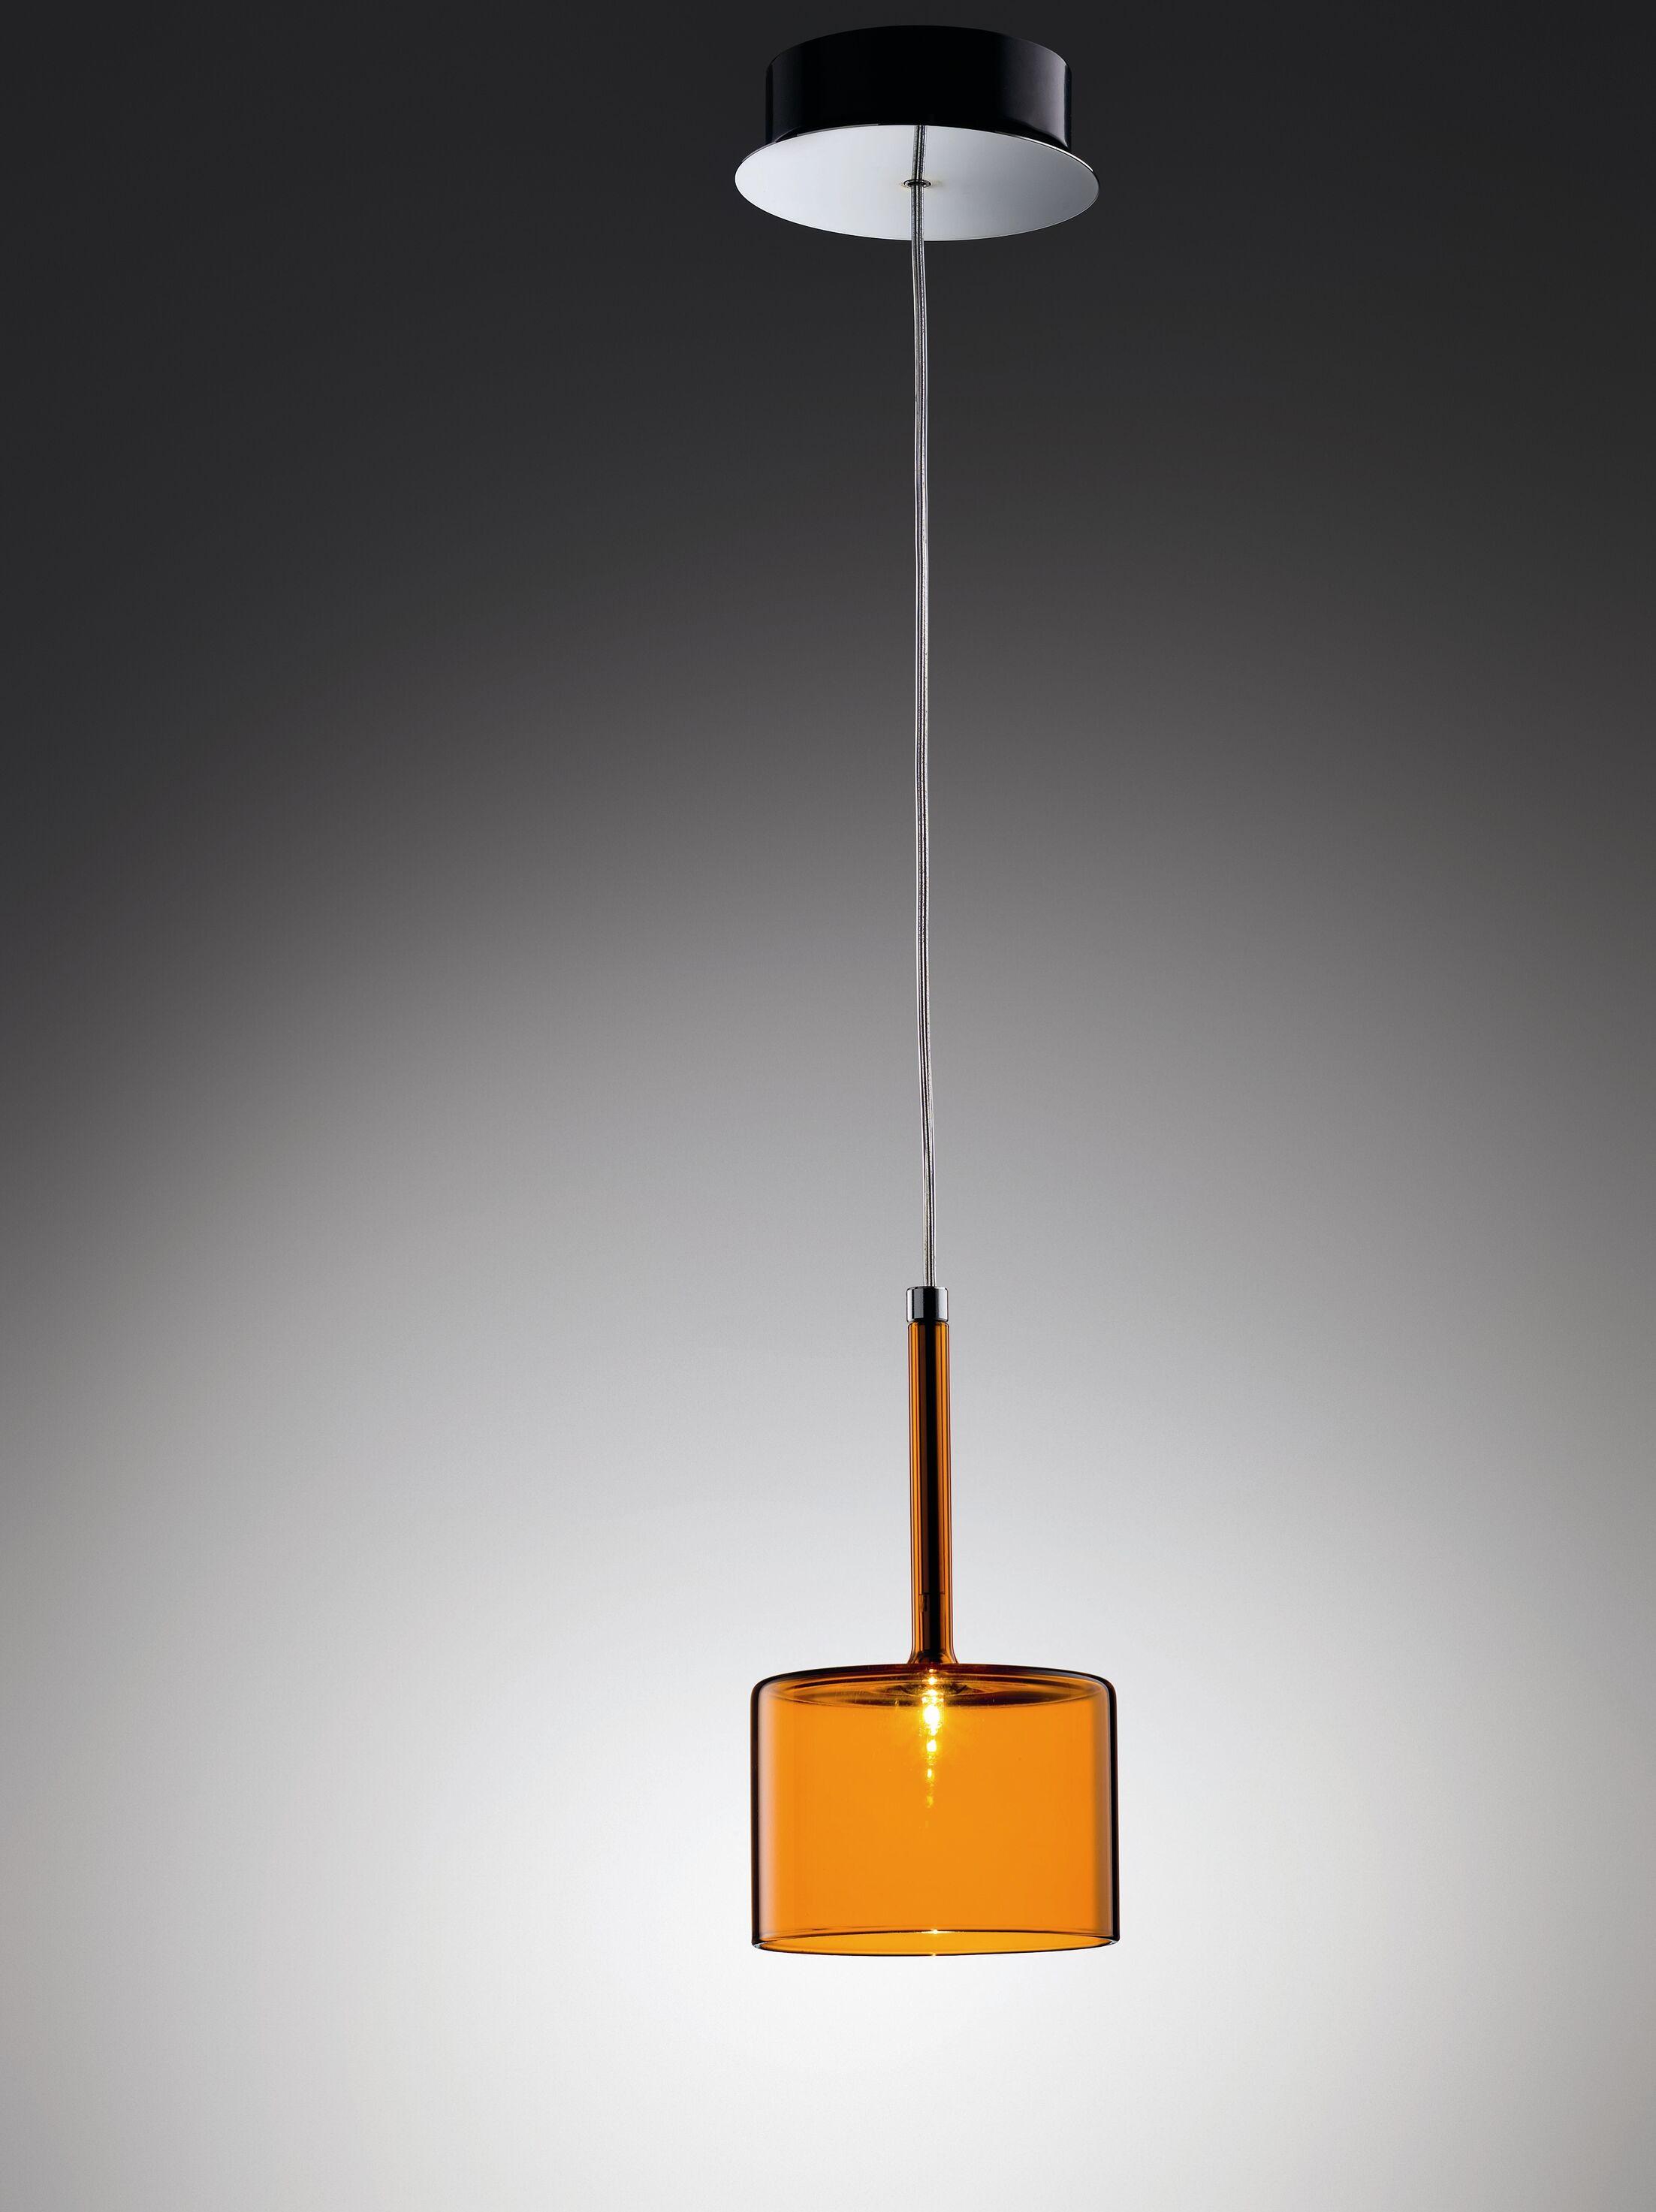 Spillray 1-Light Drum Pendant Width / Glass Color: 3.125